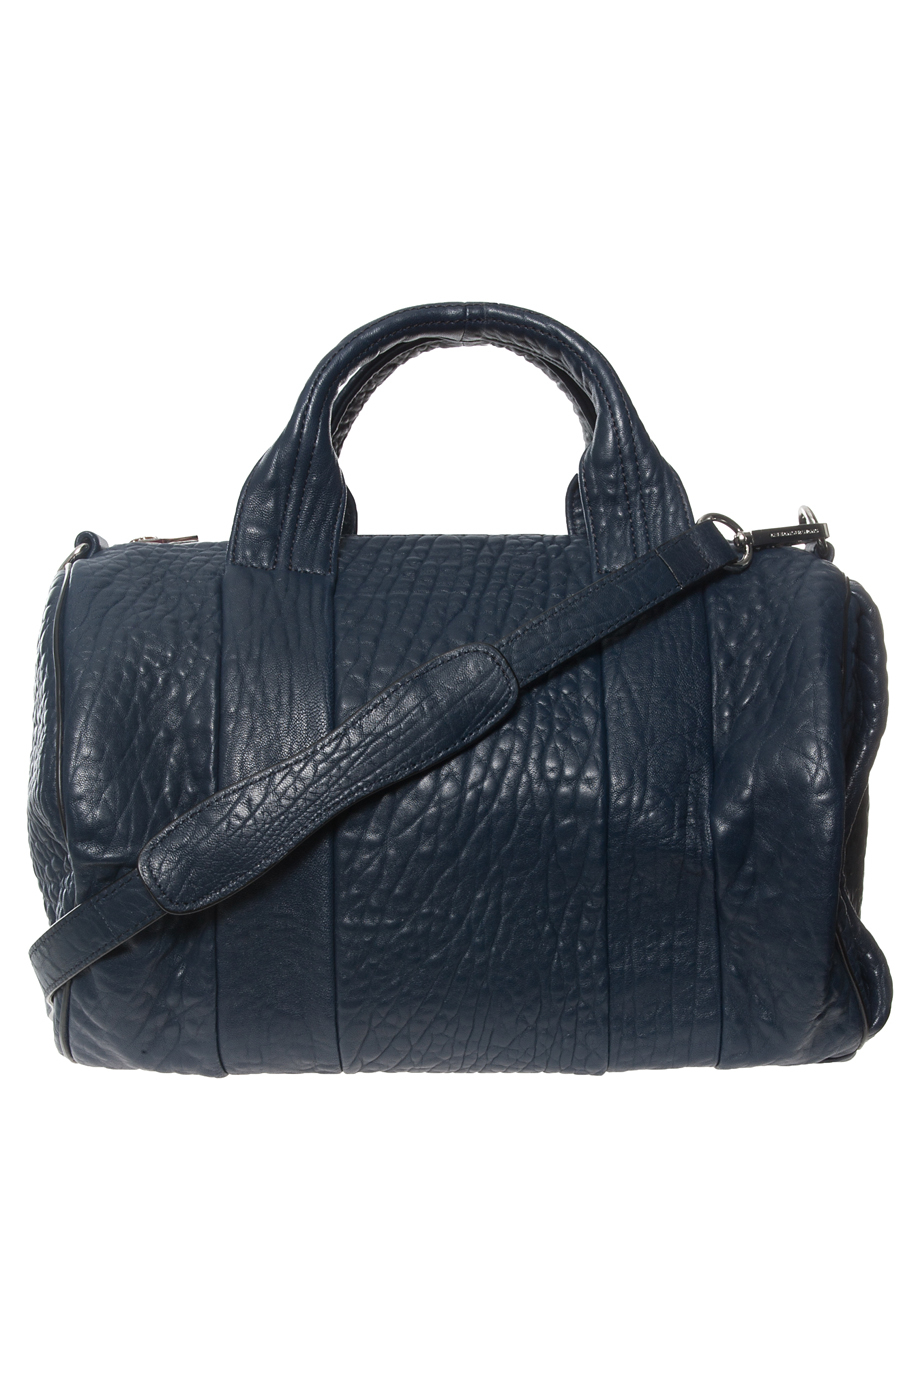 lyst alexander wang rocco stud bag in blue. Black Bedroom Furniture Sets. Home Design Ideas